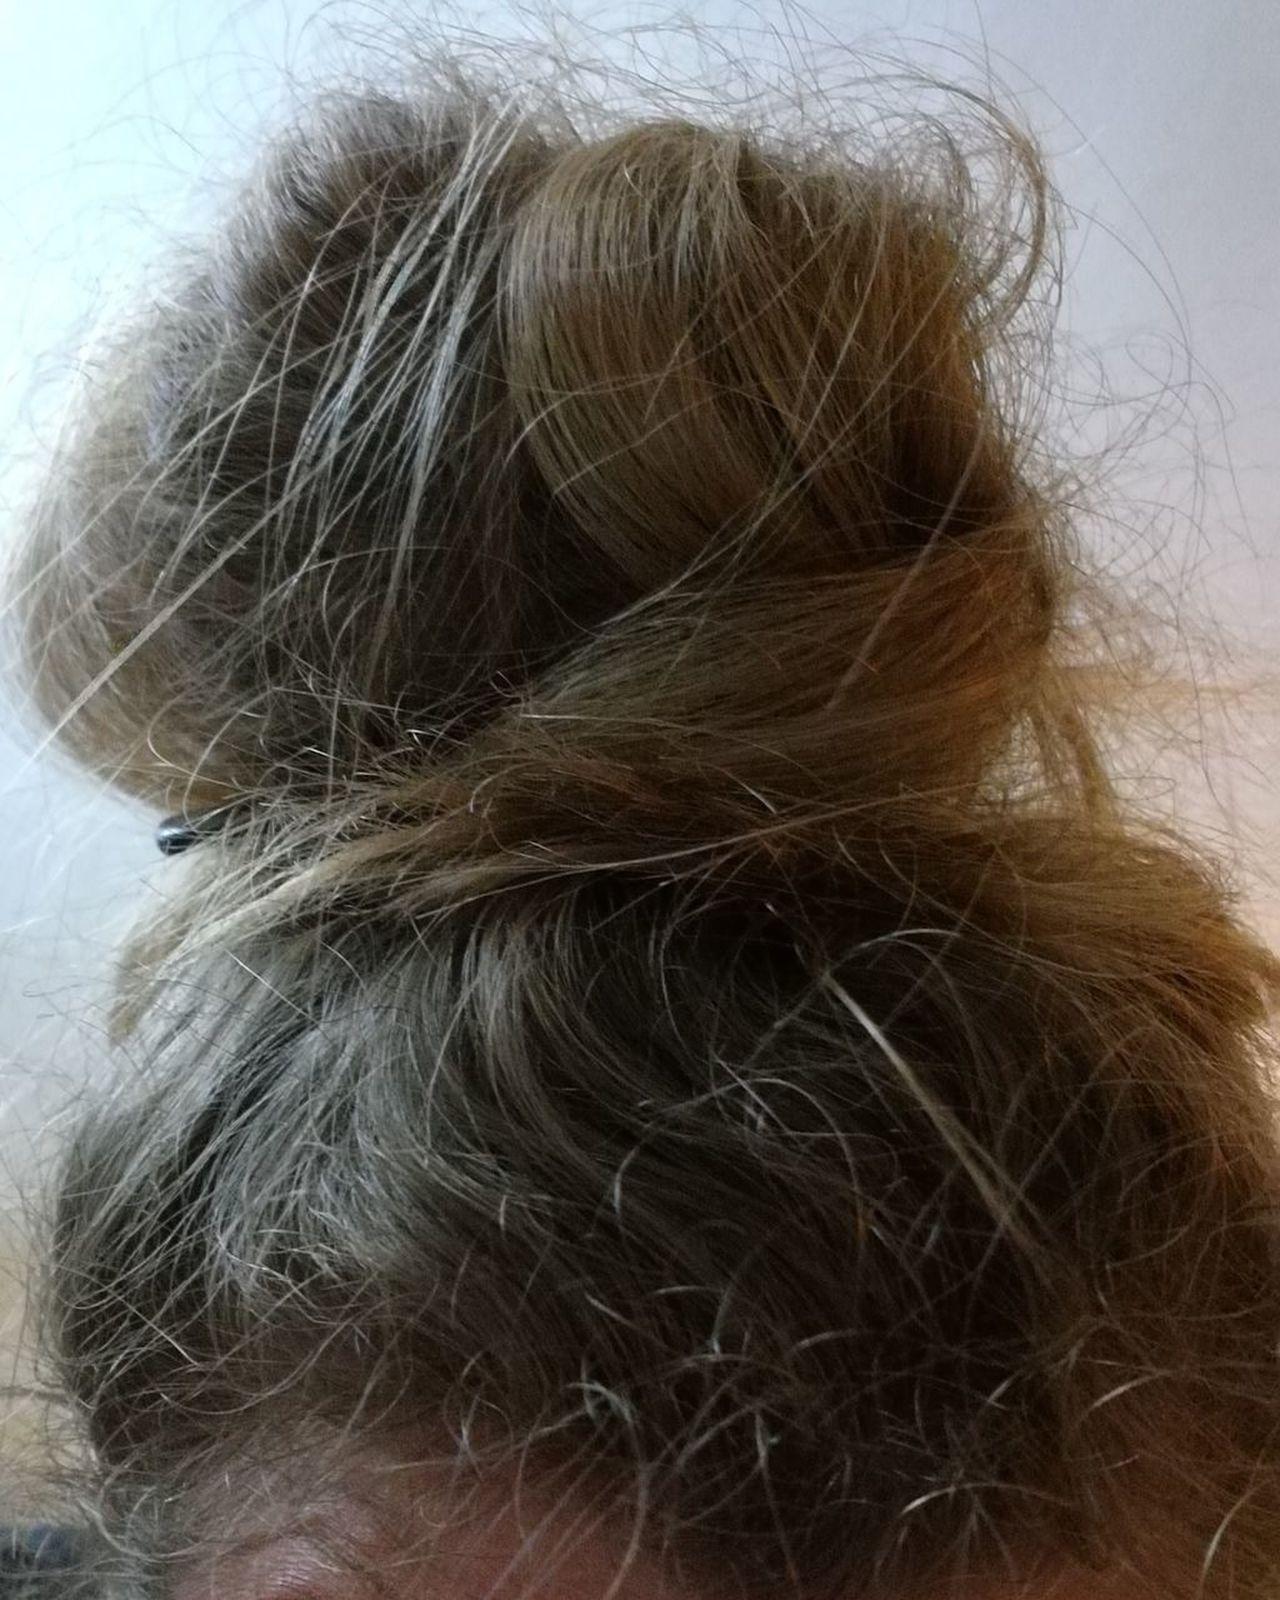 Human Hair Blond Hair Women Close-up Day Front Camera Hair Selfıe Myhair